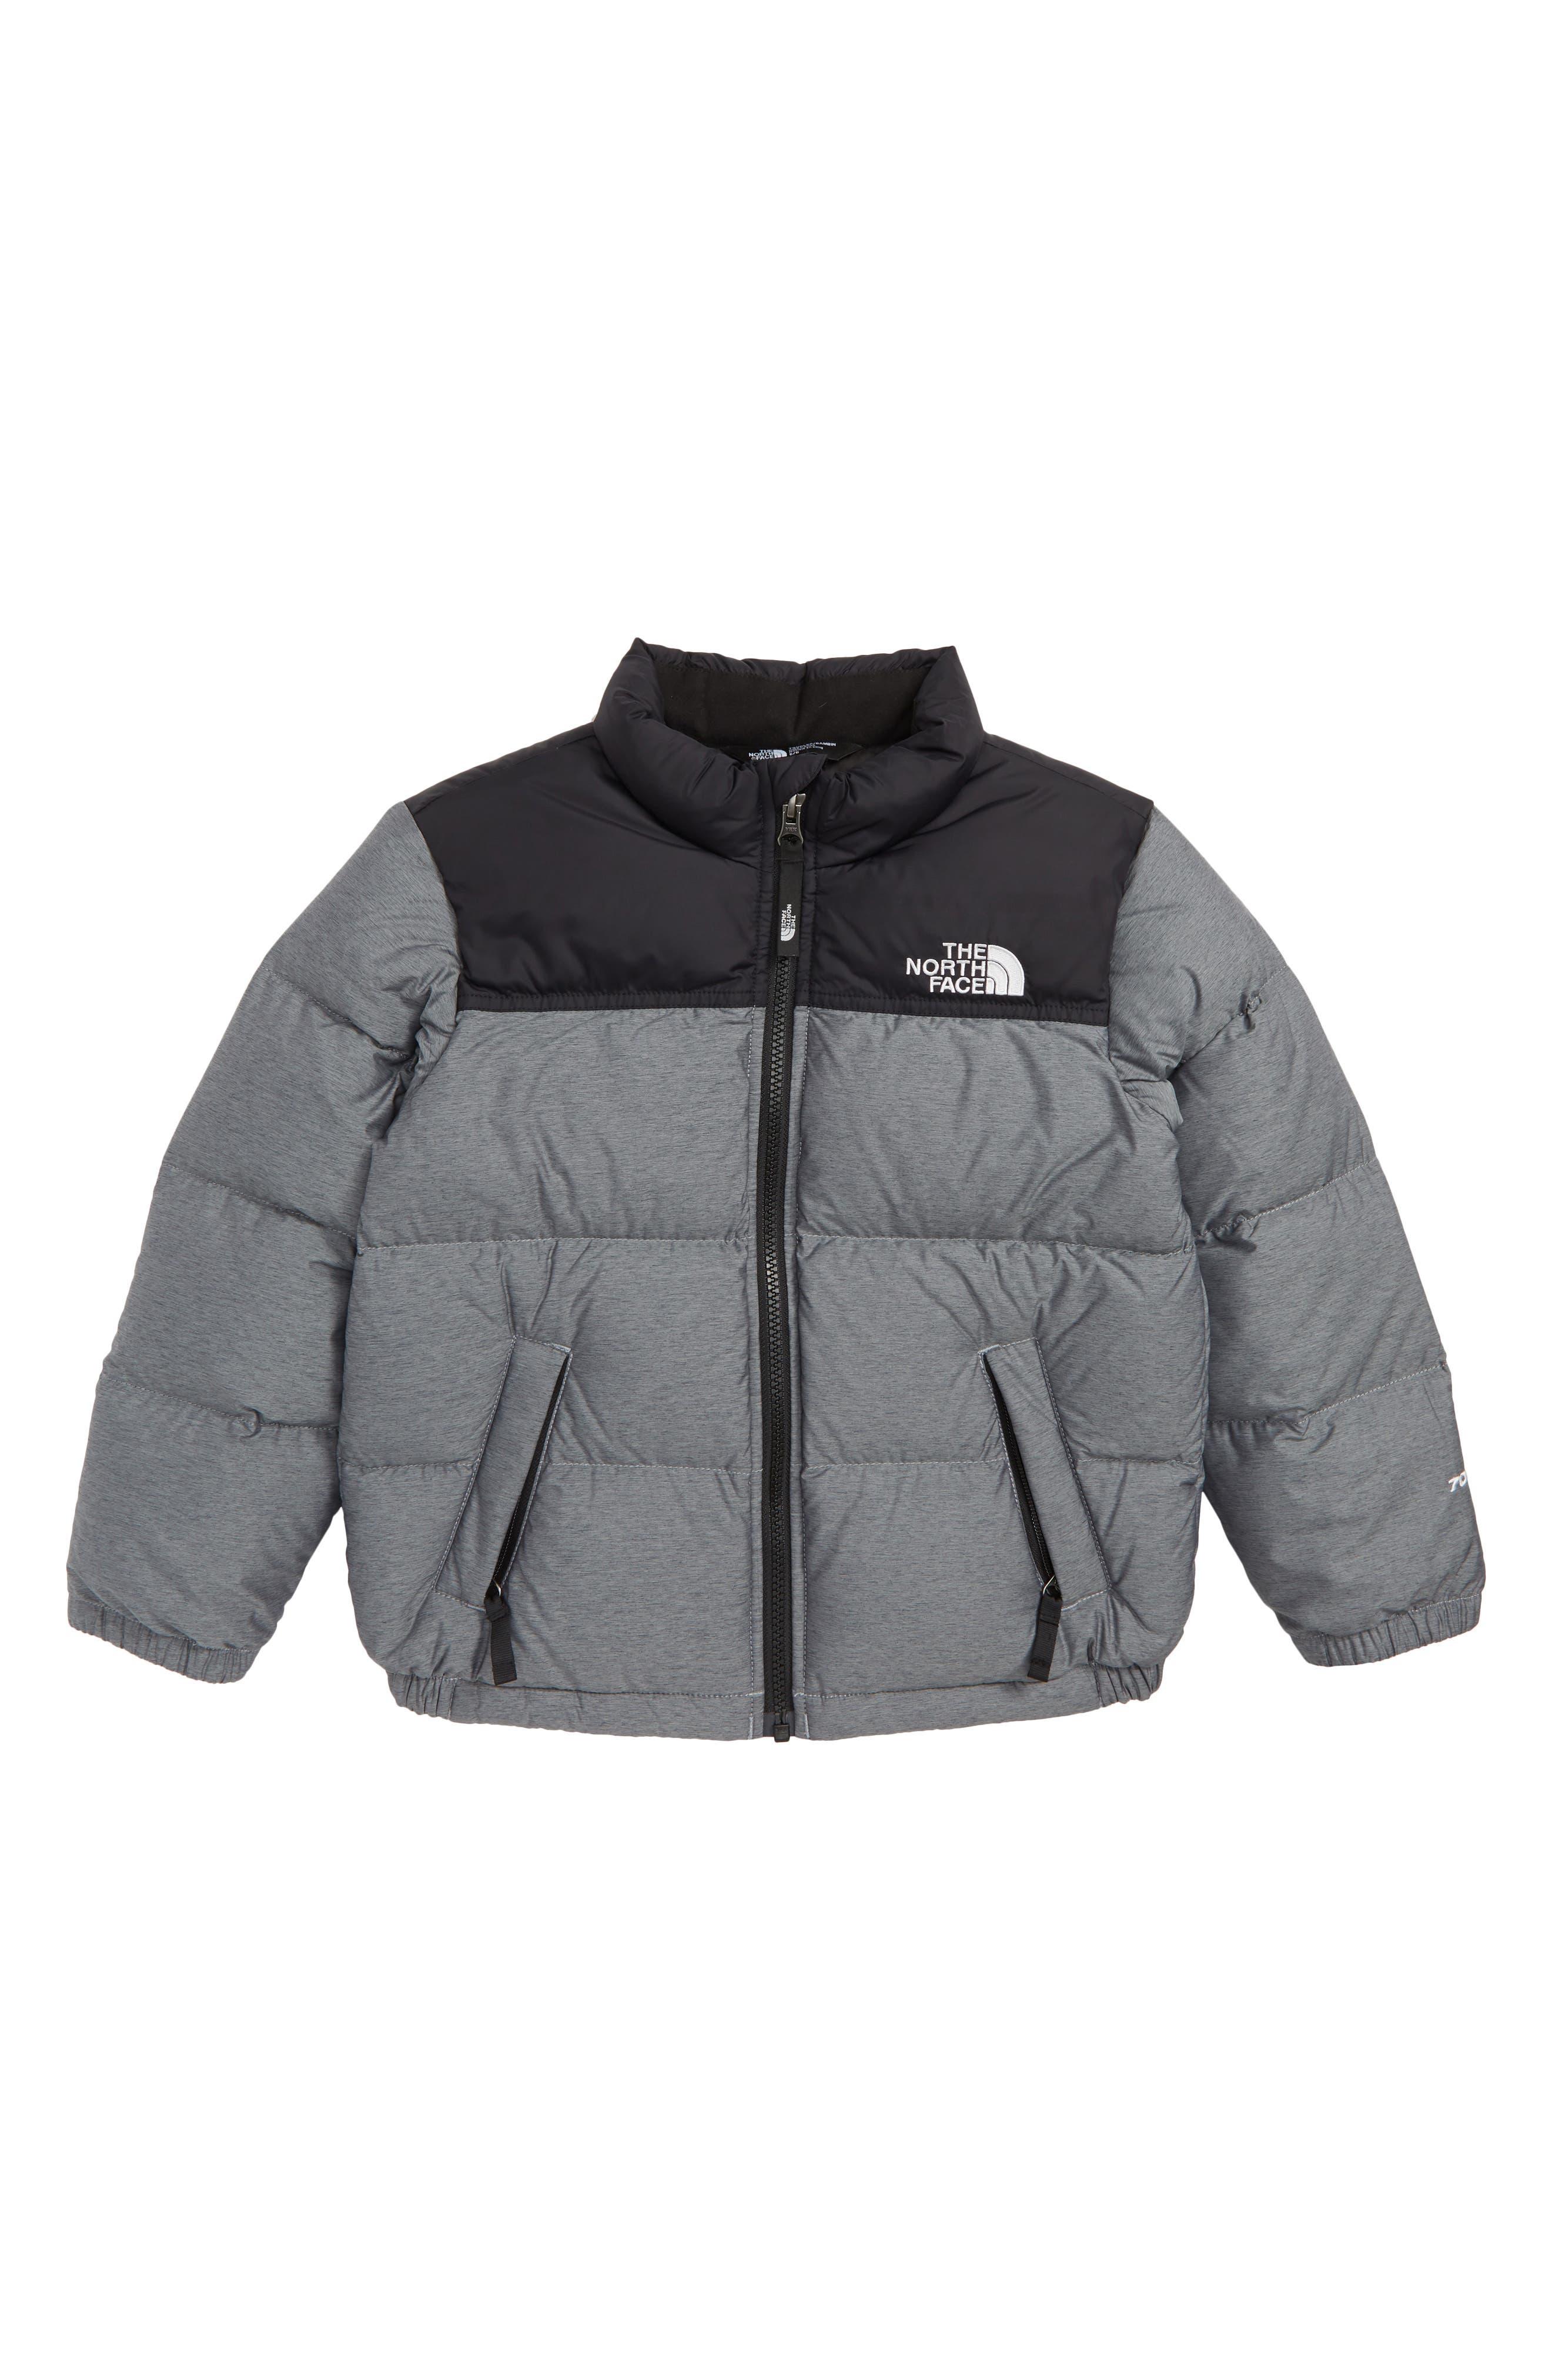 Nuptse 700 Fill Power Down Jacket,                         Main,                         color, HEATHER GREY